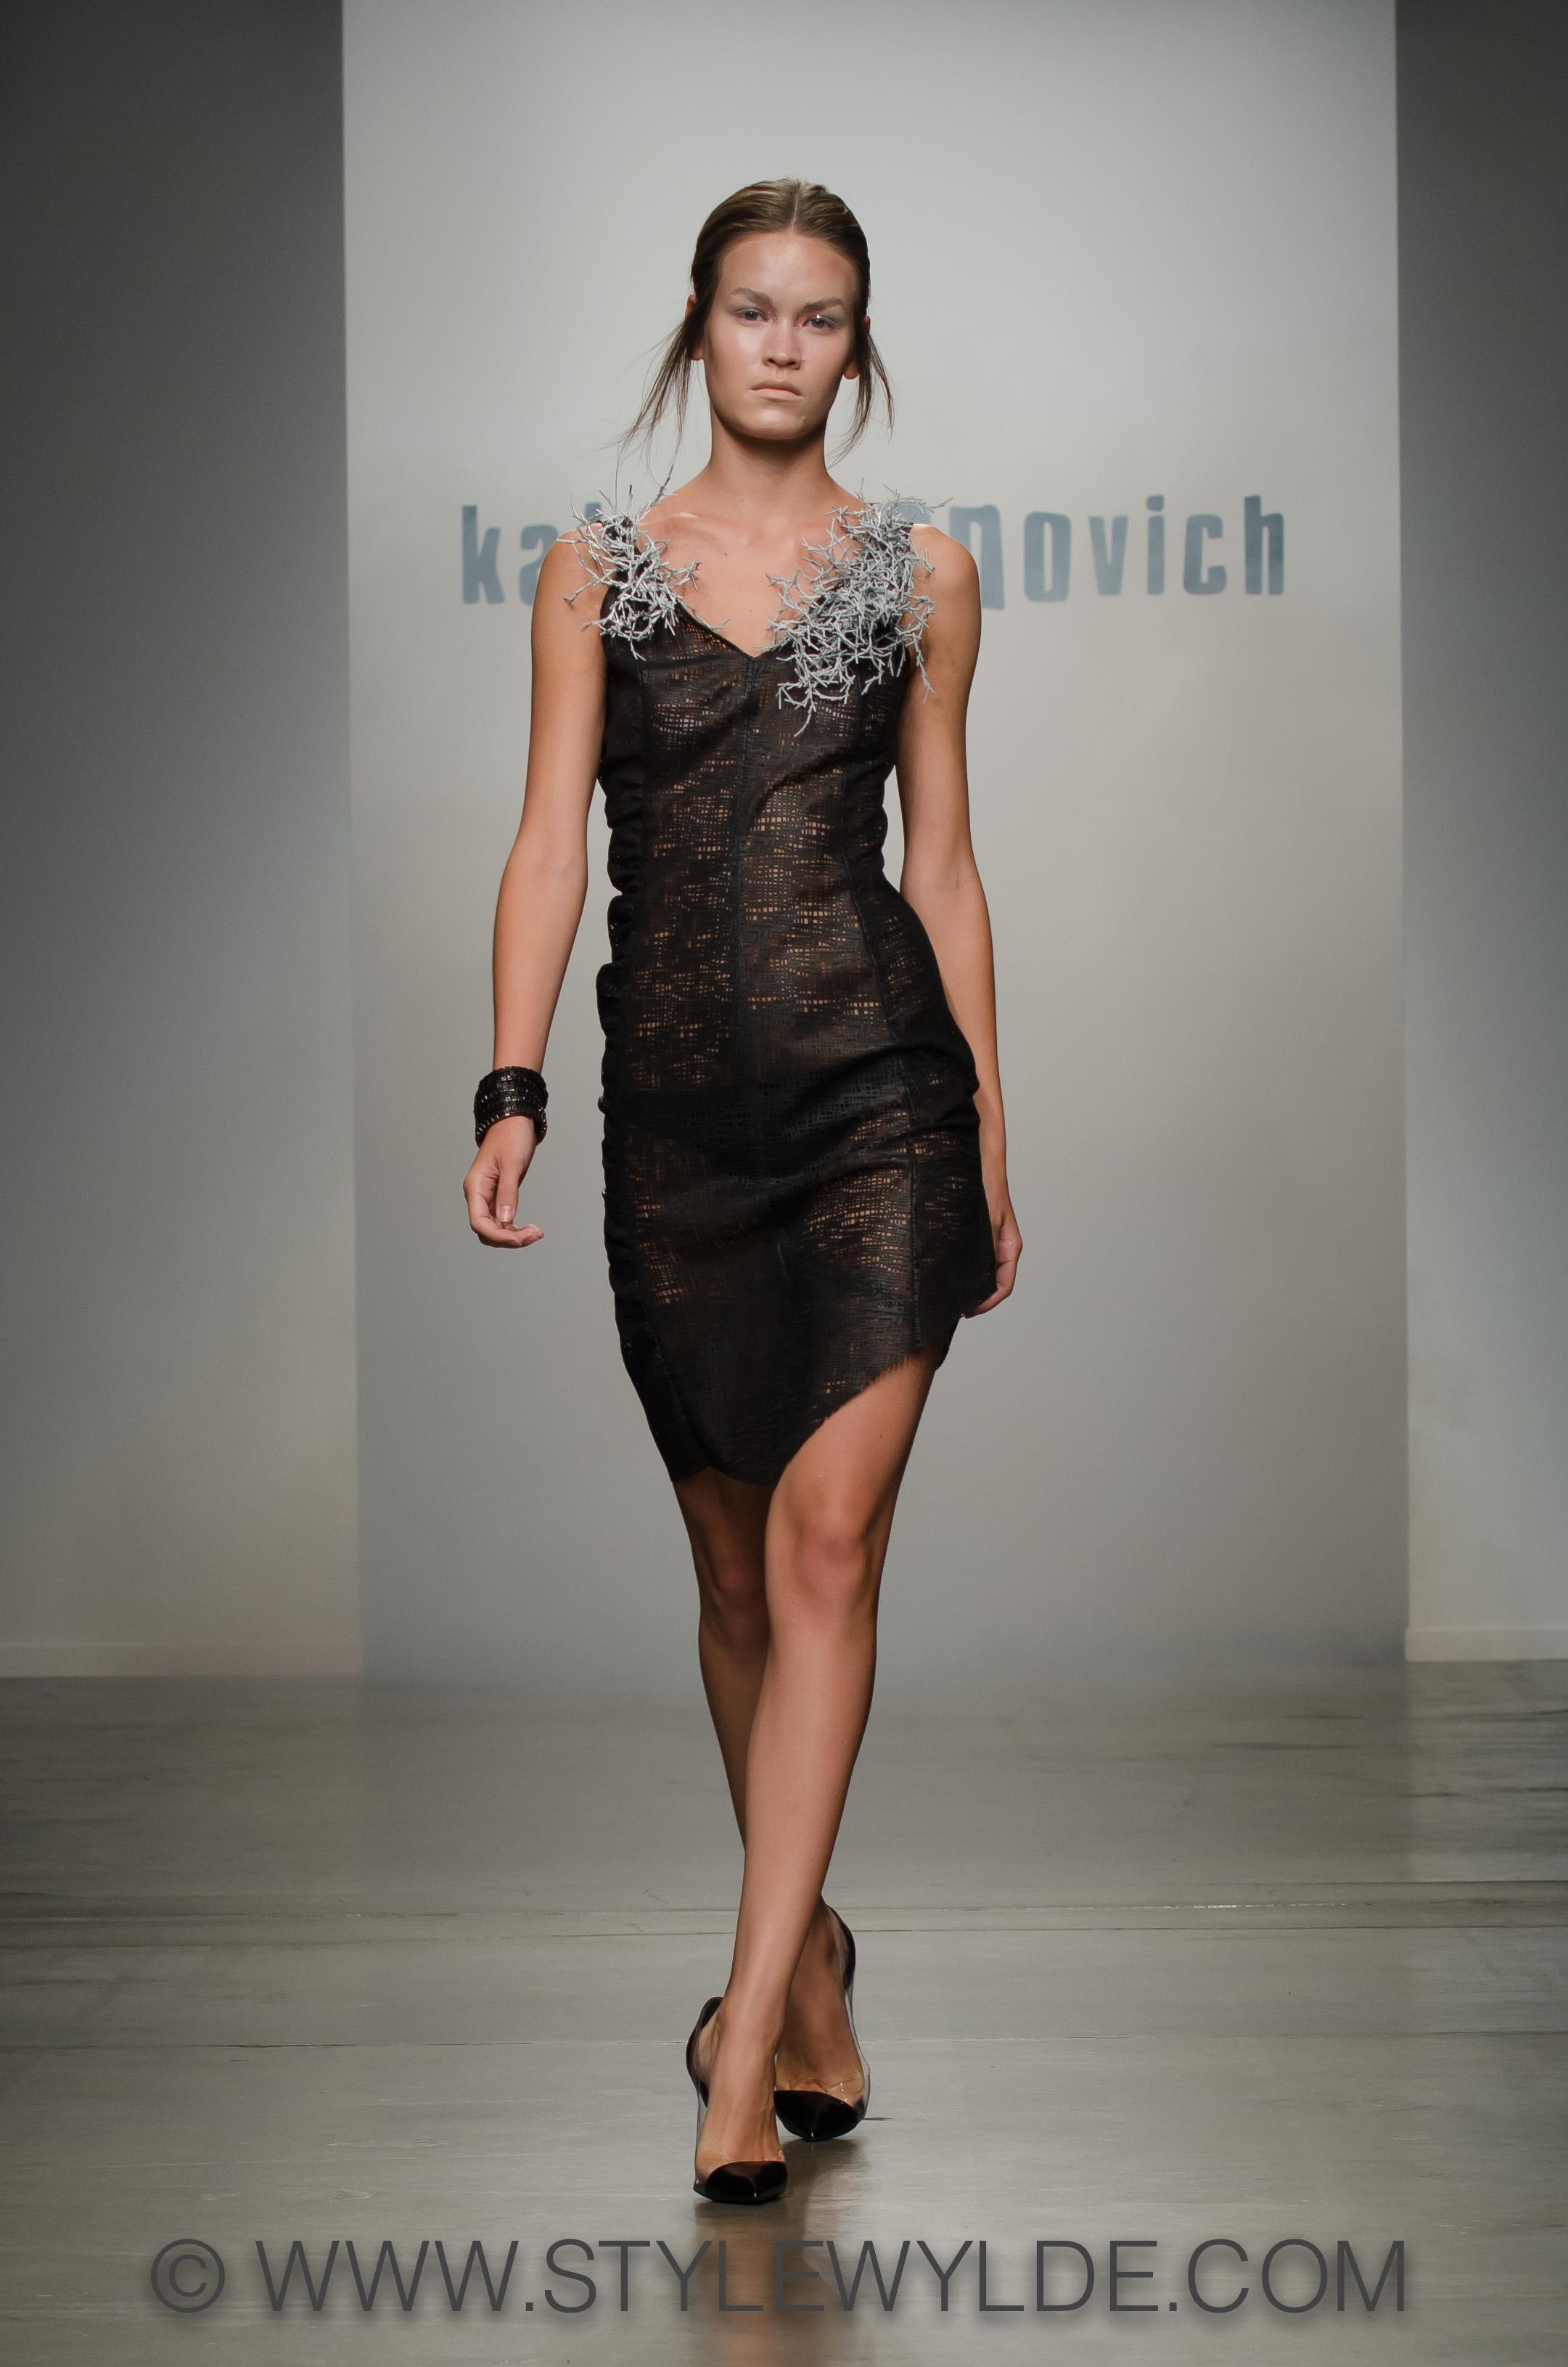 StyleWylde_KatyaSS15_FOH (1 of 28).jpg